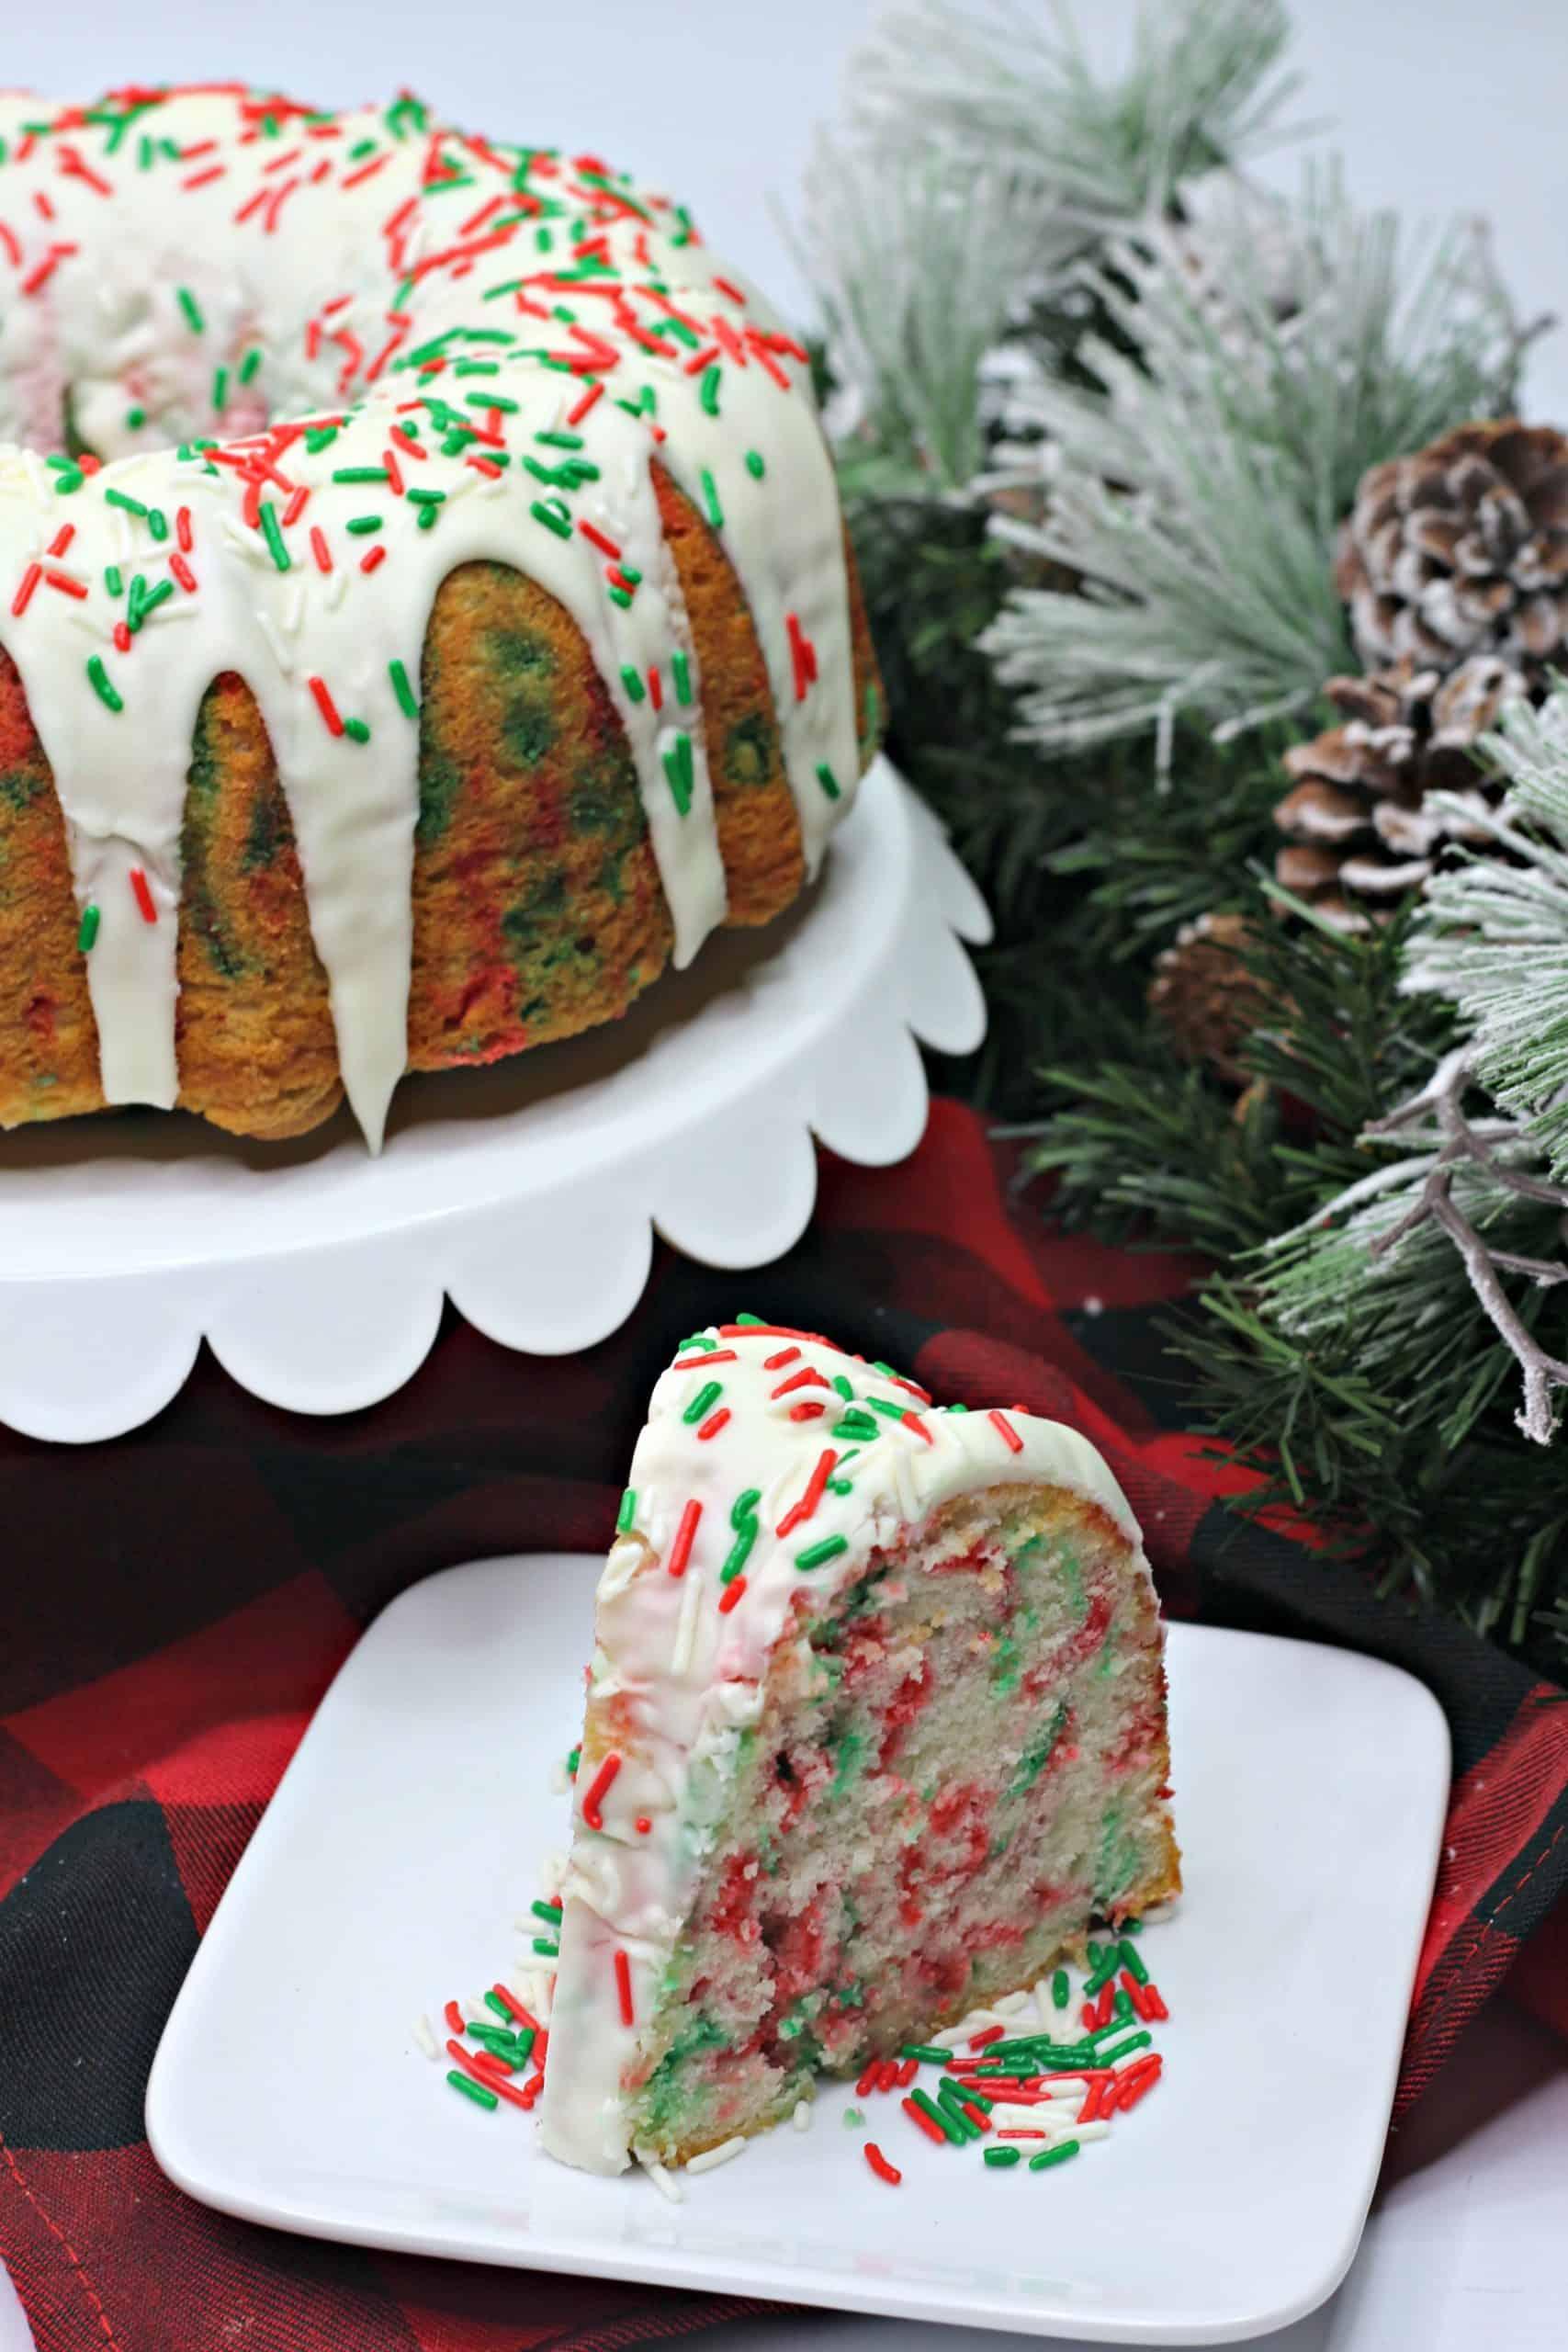 Christmas Funfetti Cake Slice